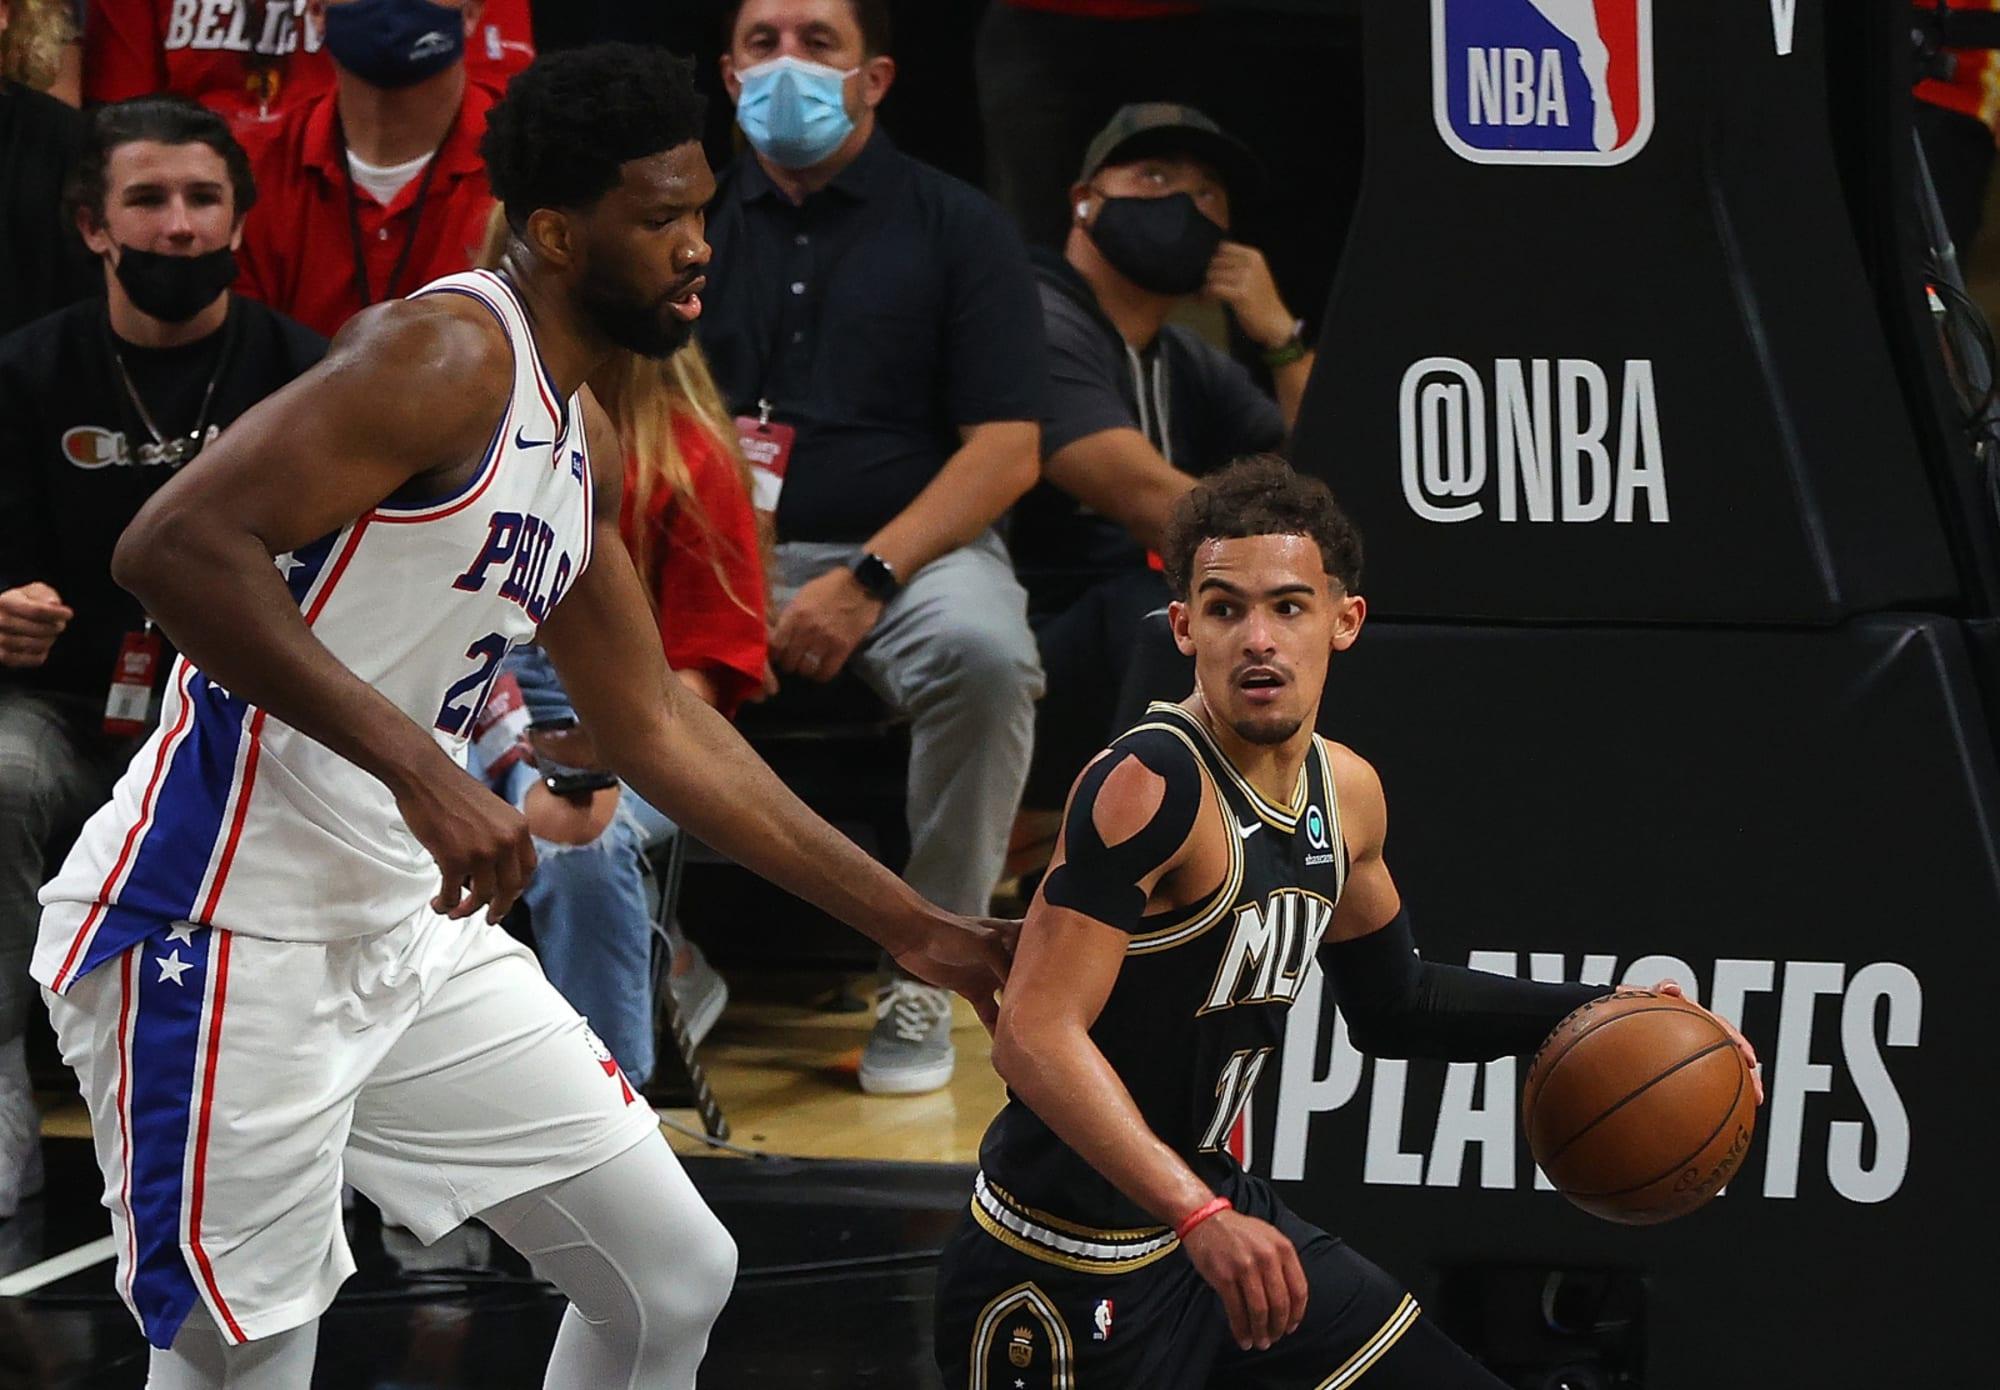 Hawks vs 76ers NBA live stream reddit for NBA Playoffs Game 7